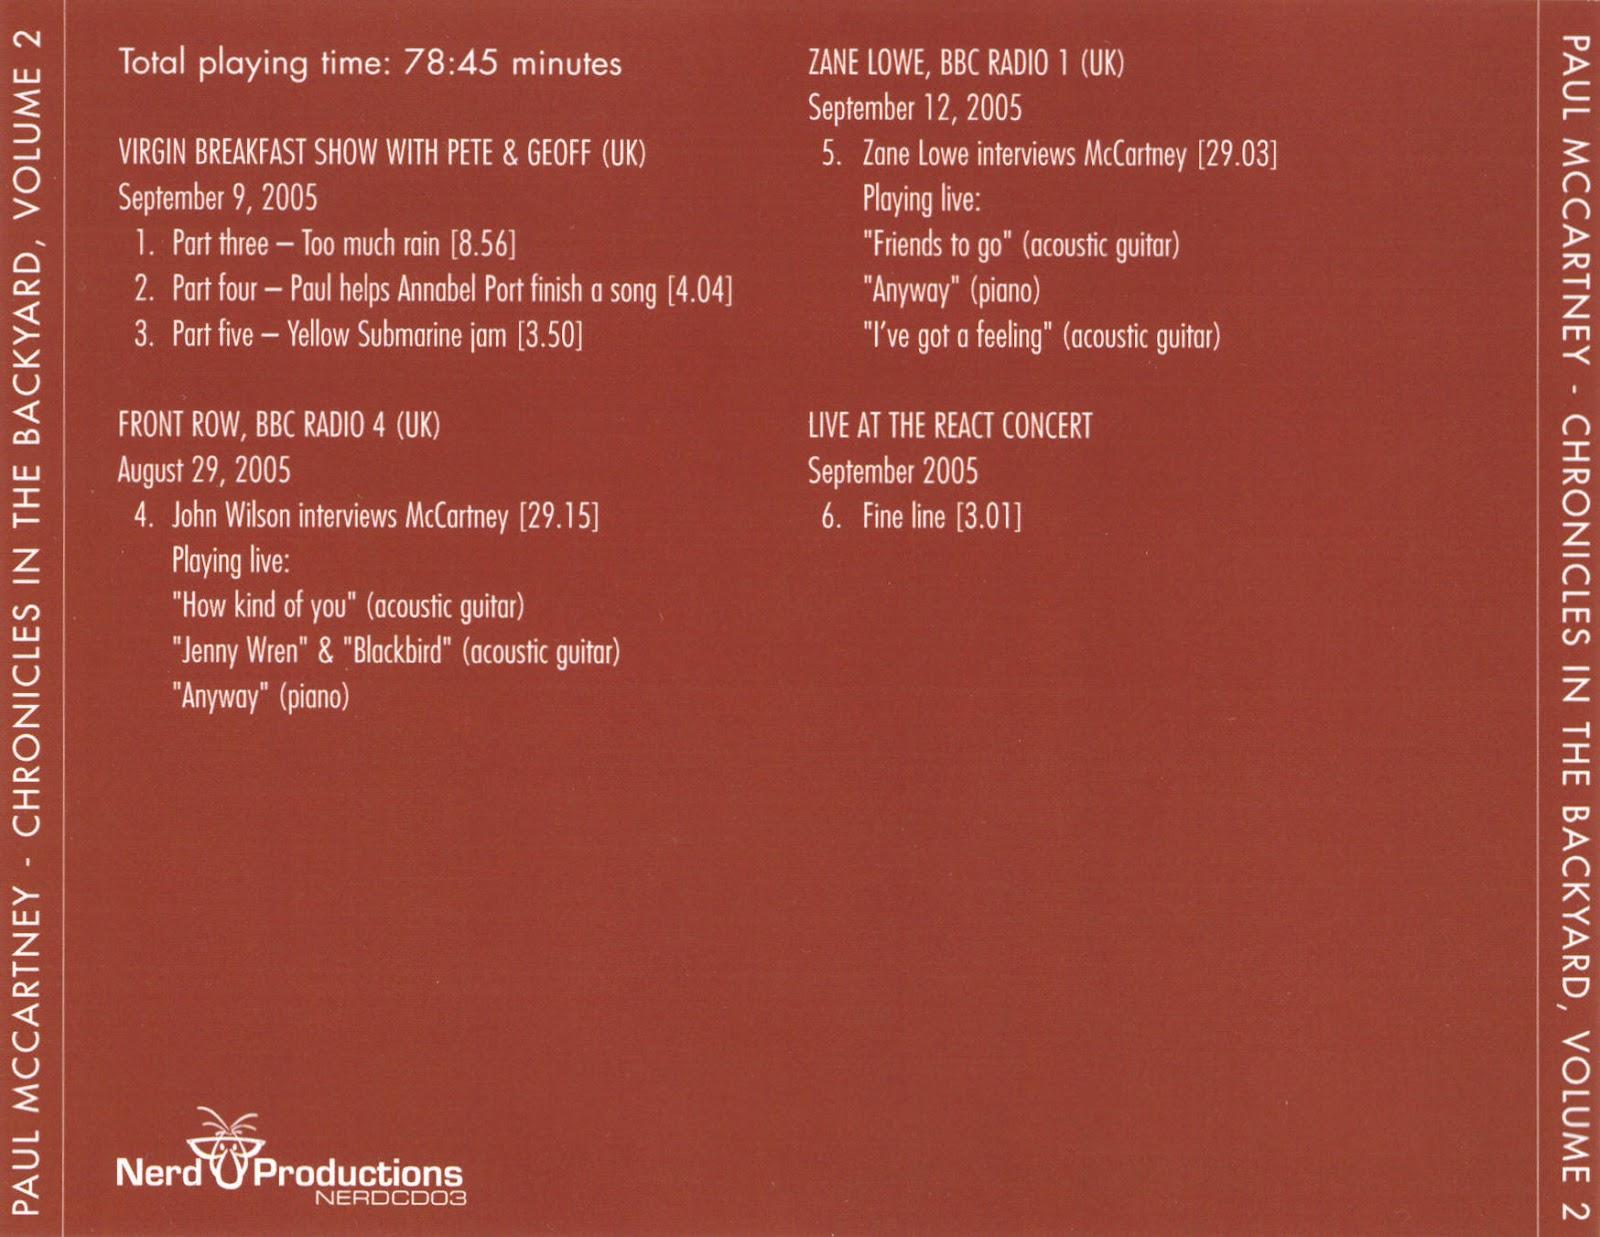 Beatles Radio Waves: 2005 - Chronicles in the Backyard 02